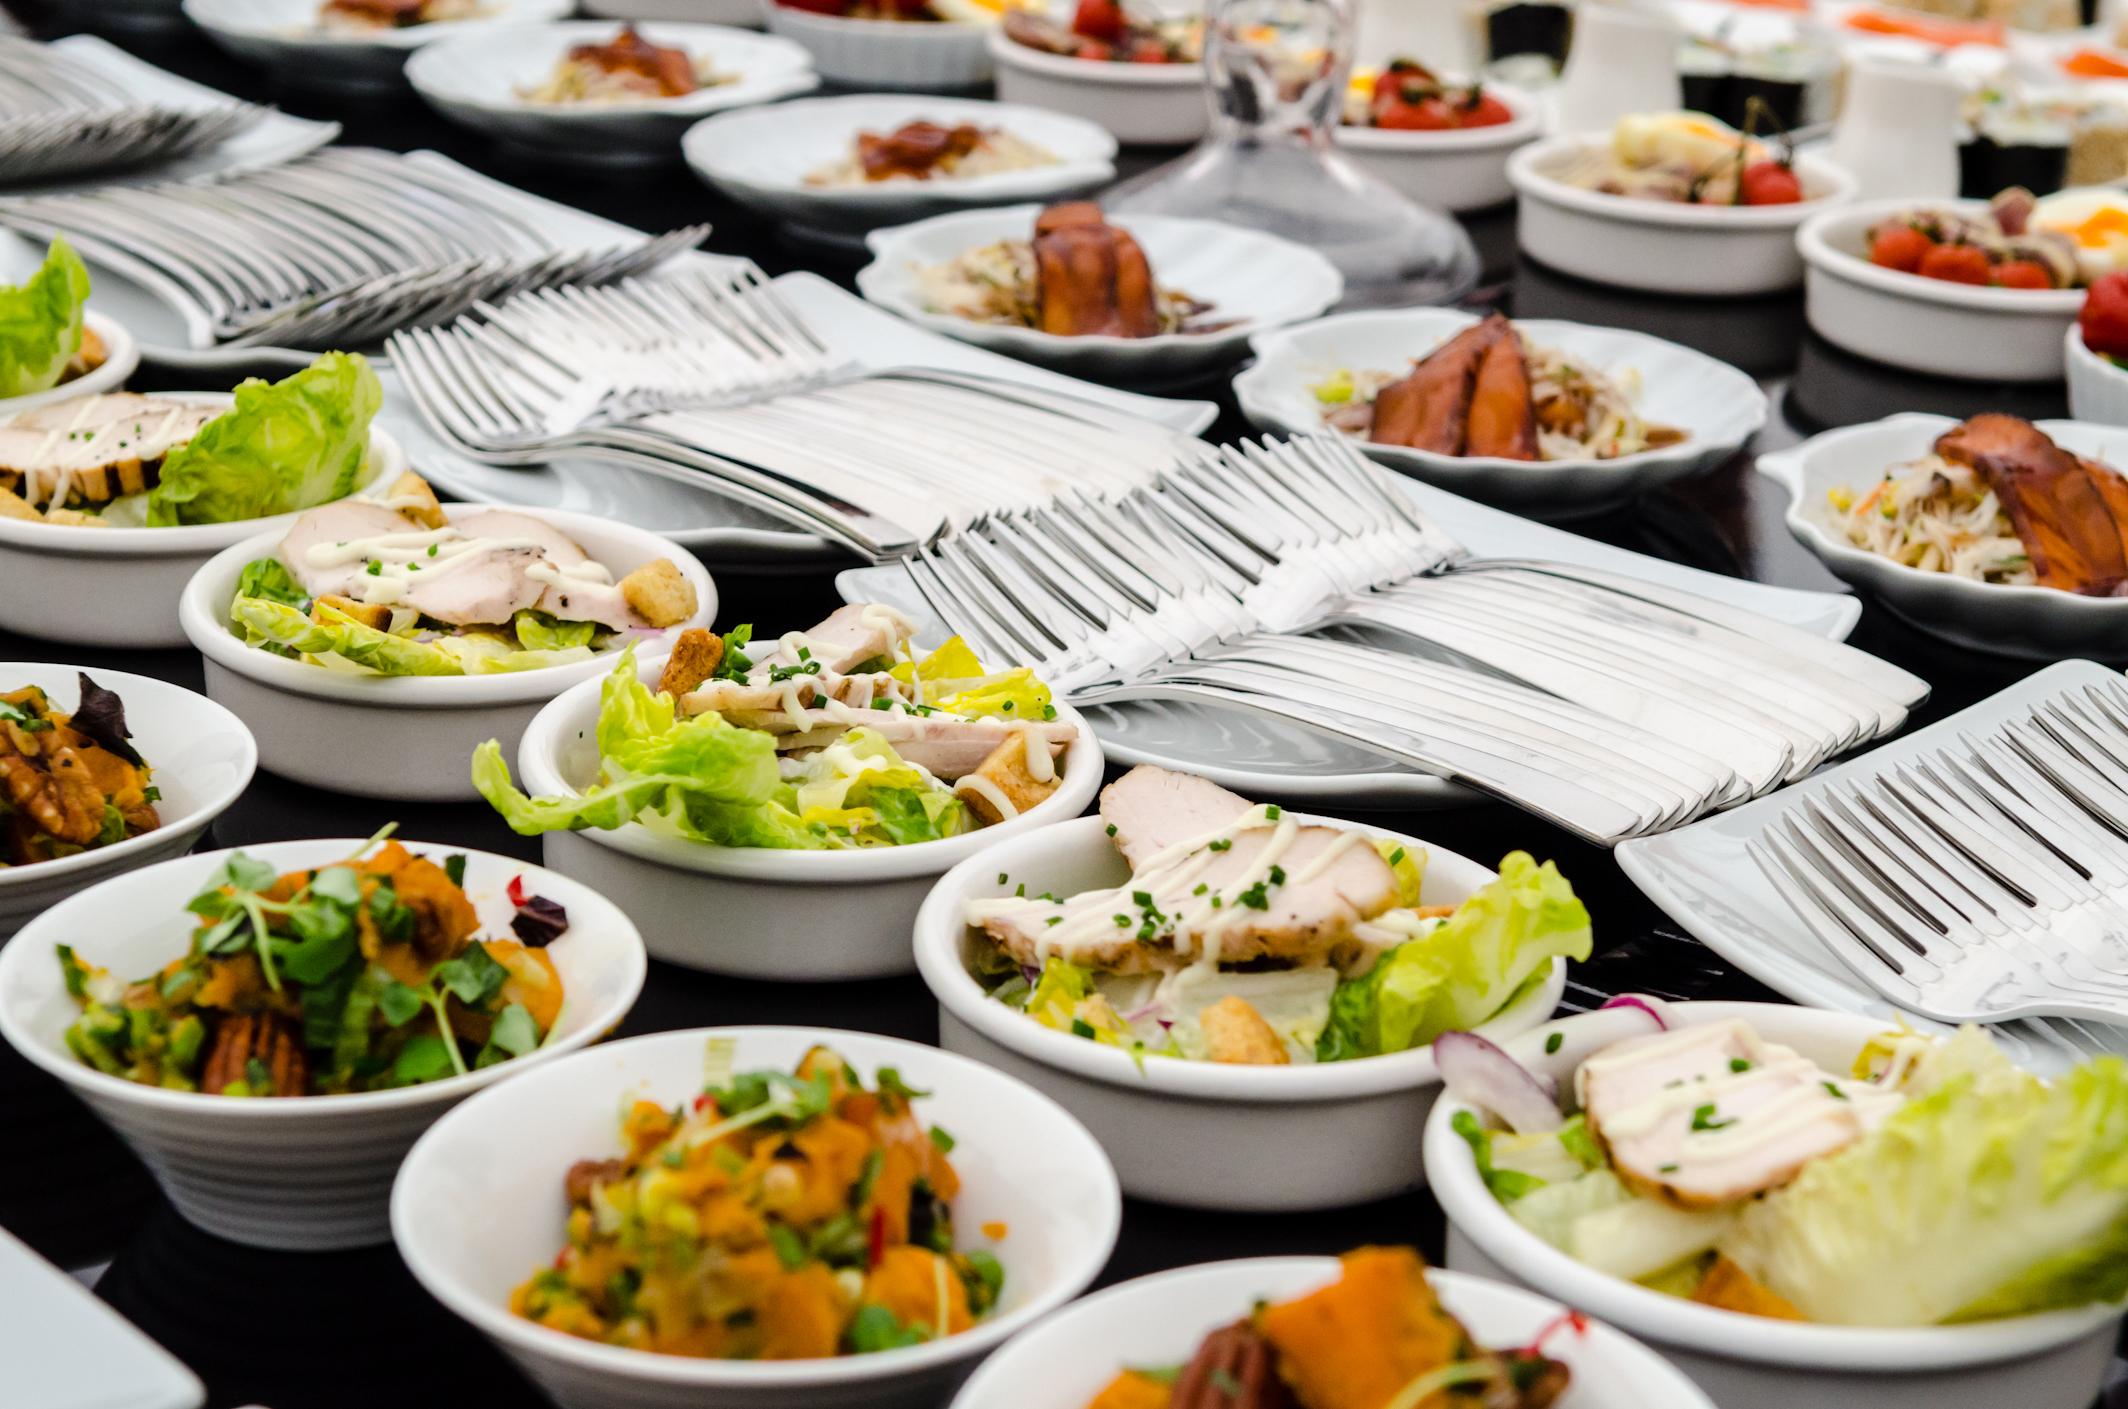 Royale cuisine gallery for Cuisine vipp